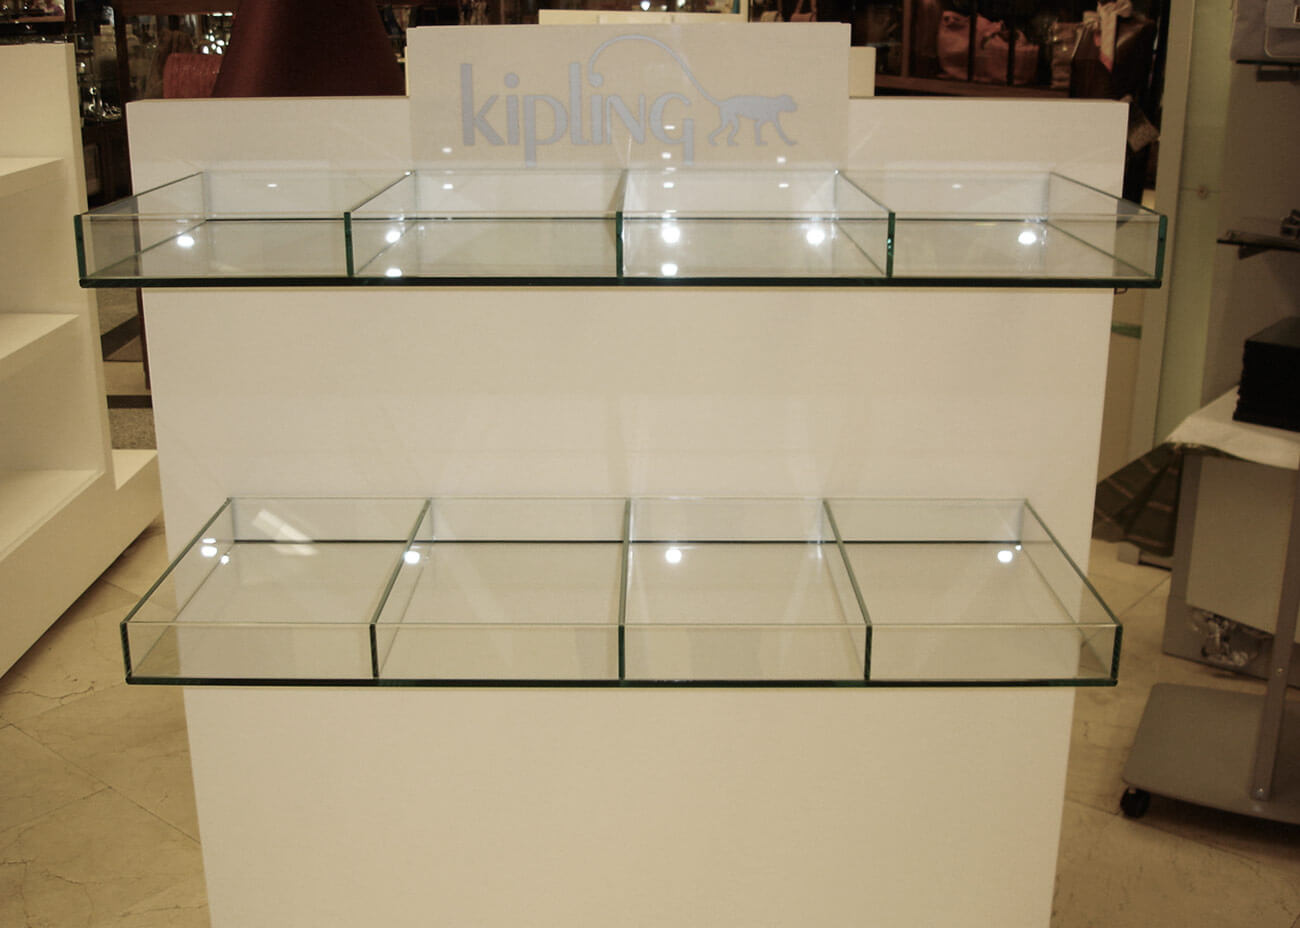 kipling-img03-caad-retail-design-barcelona-Recuperado